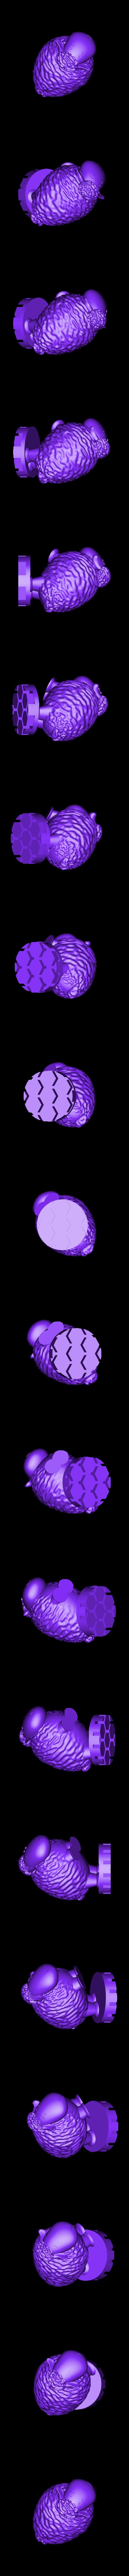 Zoetrope_Prusament Spool_by Dominik Cisar_Sheep 02.stl Download free STL file SPIROGRAPH - PRUSAMENT SPOOL - reuse idea • 3D print model, cisardom